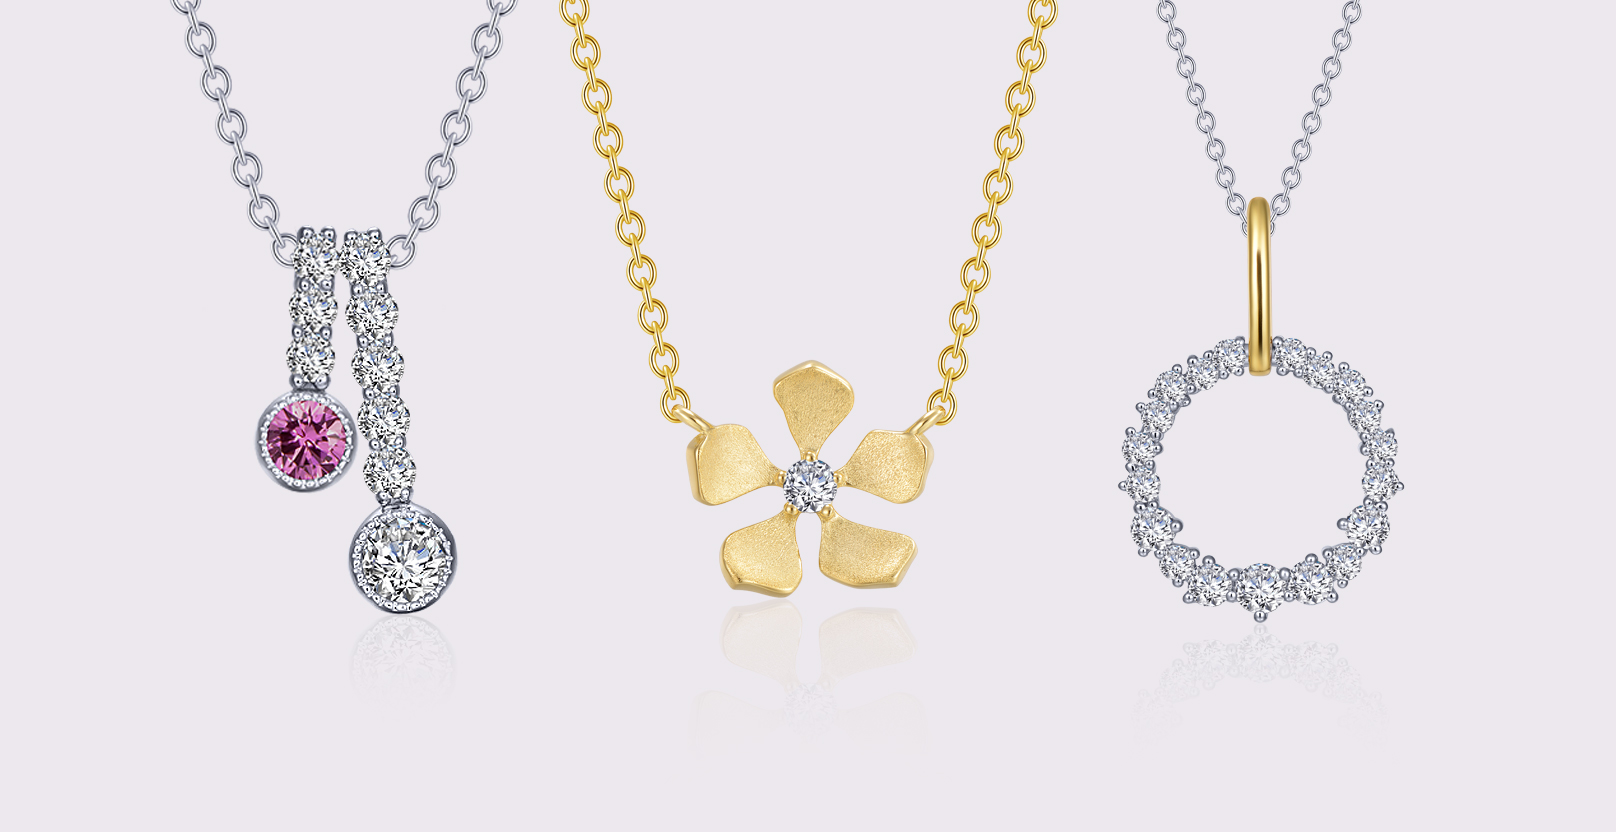 top-banner-necklaces-0920.jpg